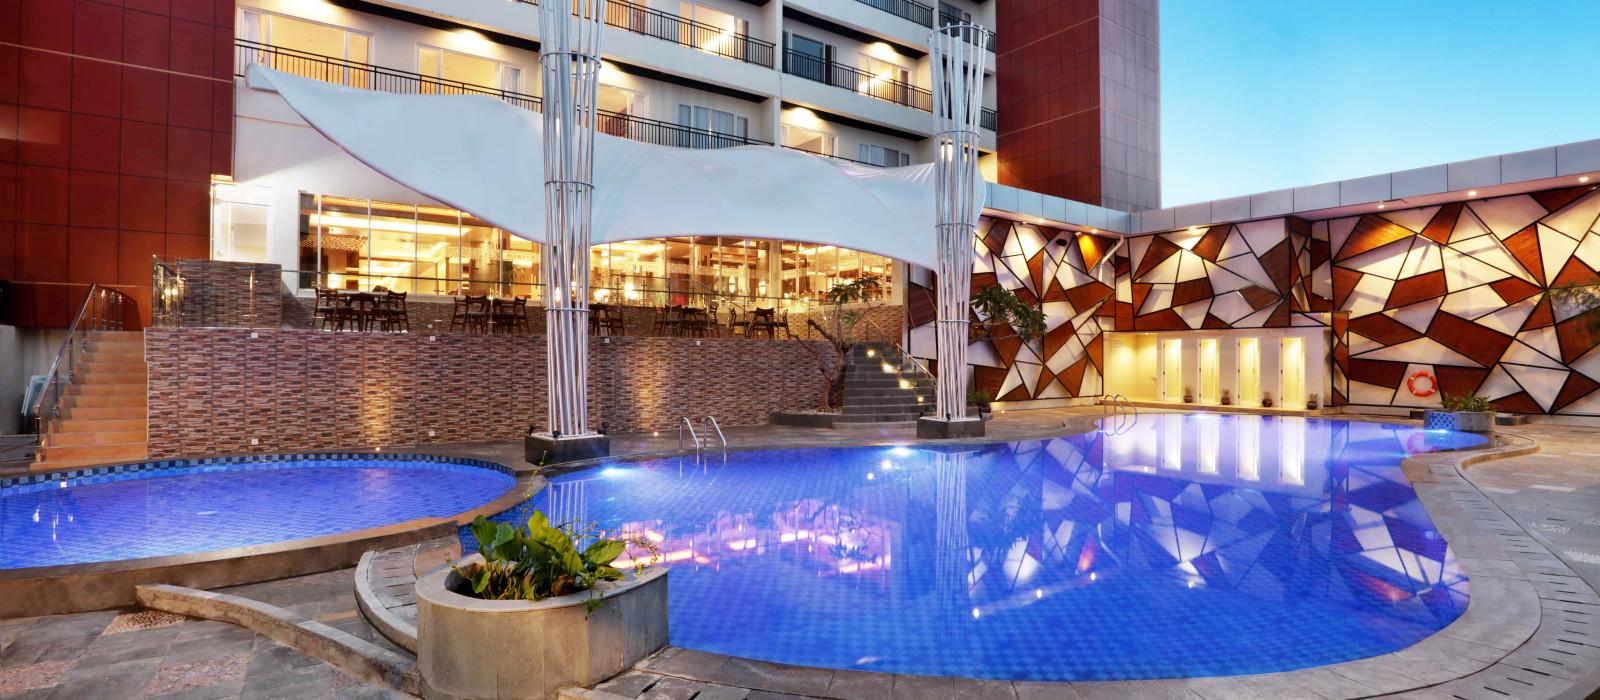 Hotel Harper Perintis Makassar Indonesien